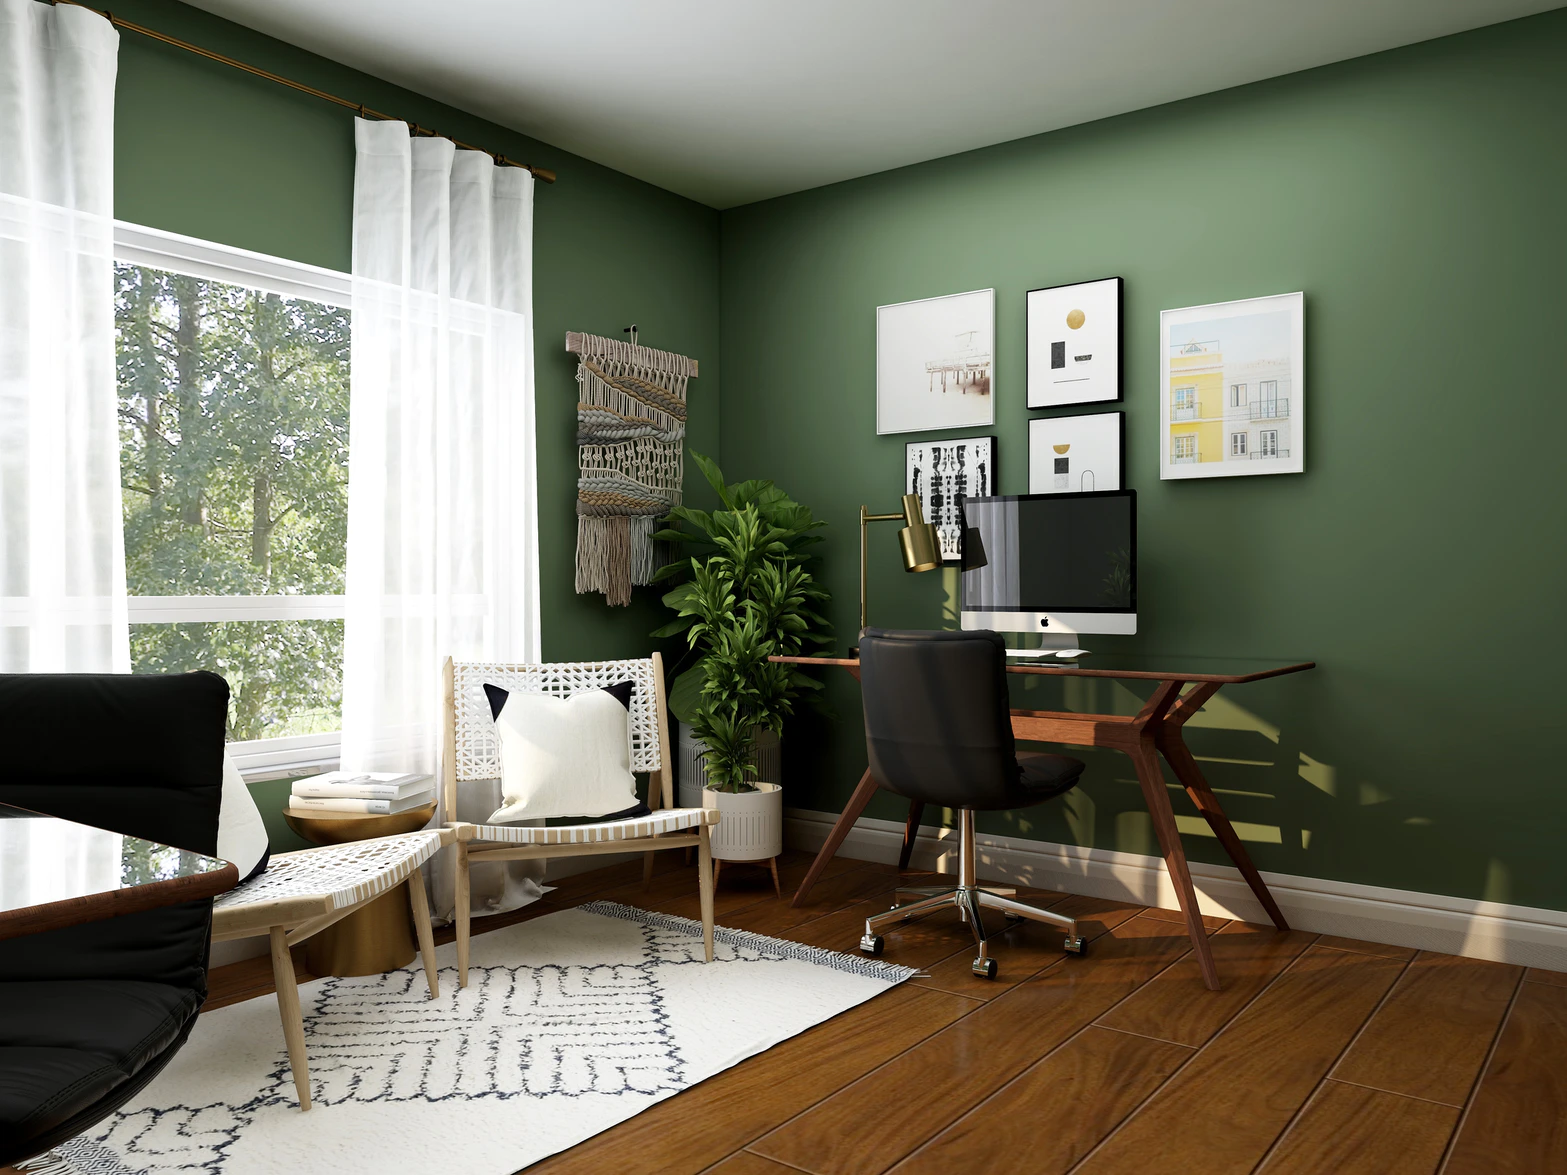 Wallpaper, interior design, design ideas, staging a home